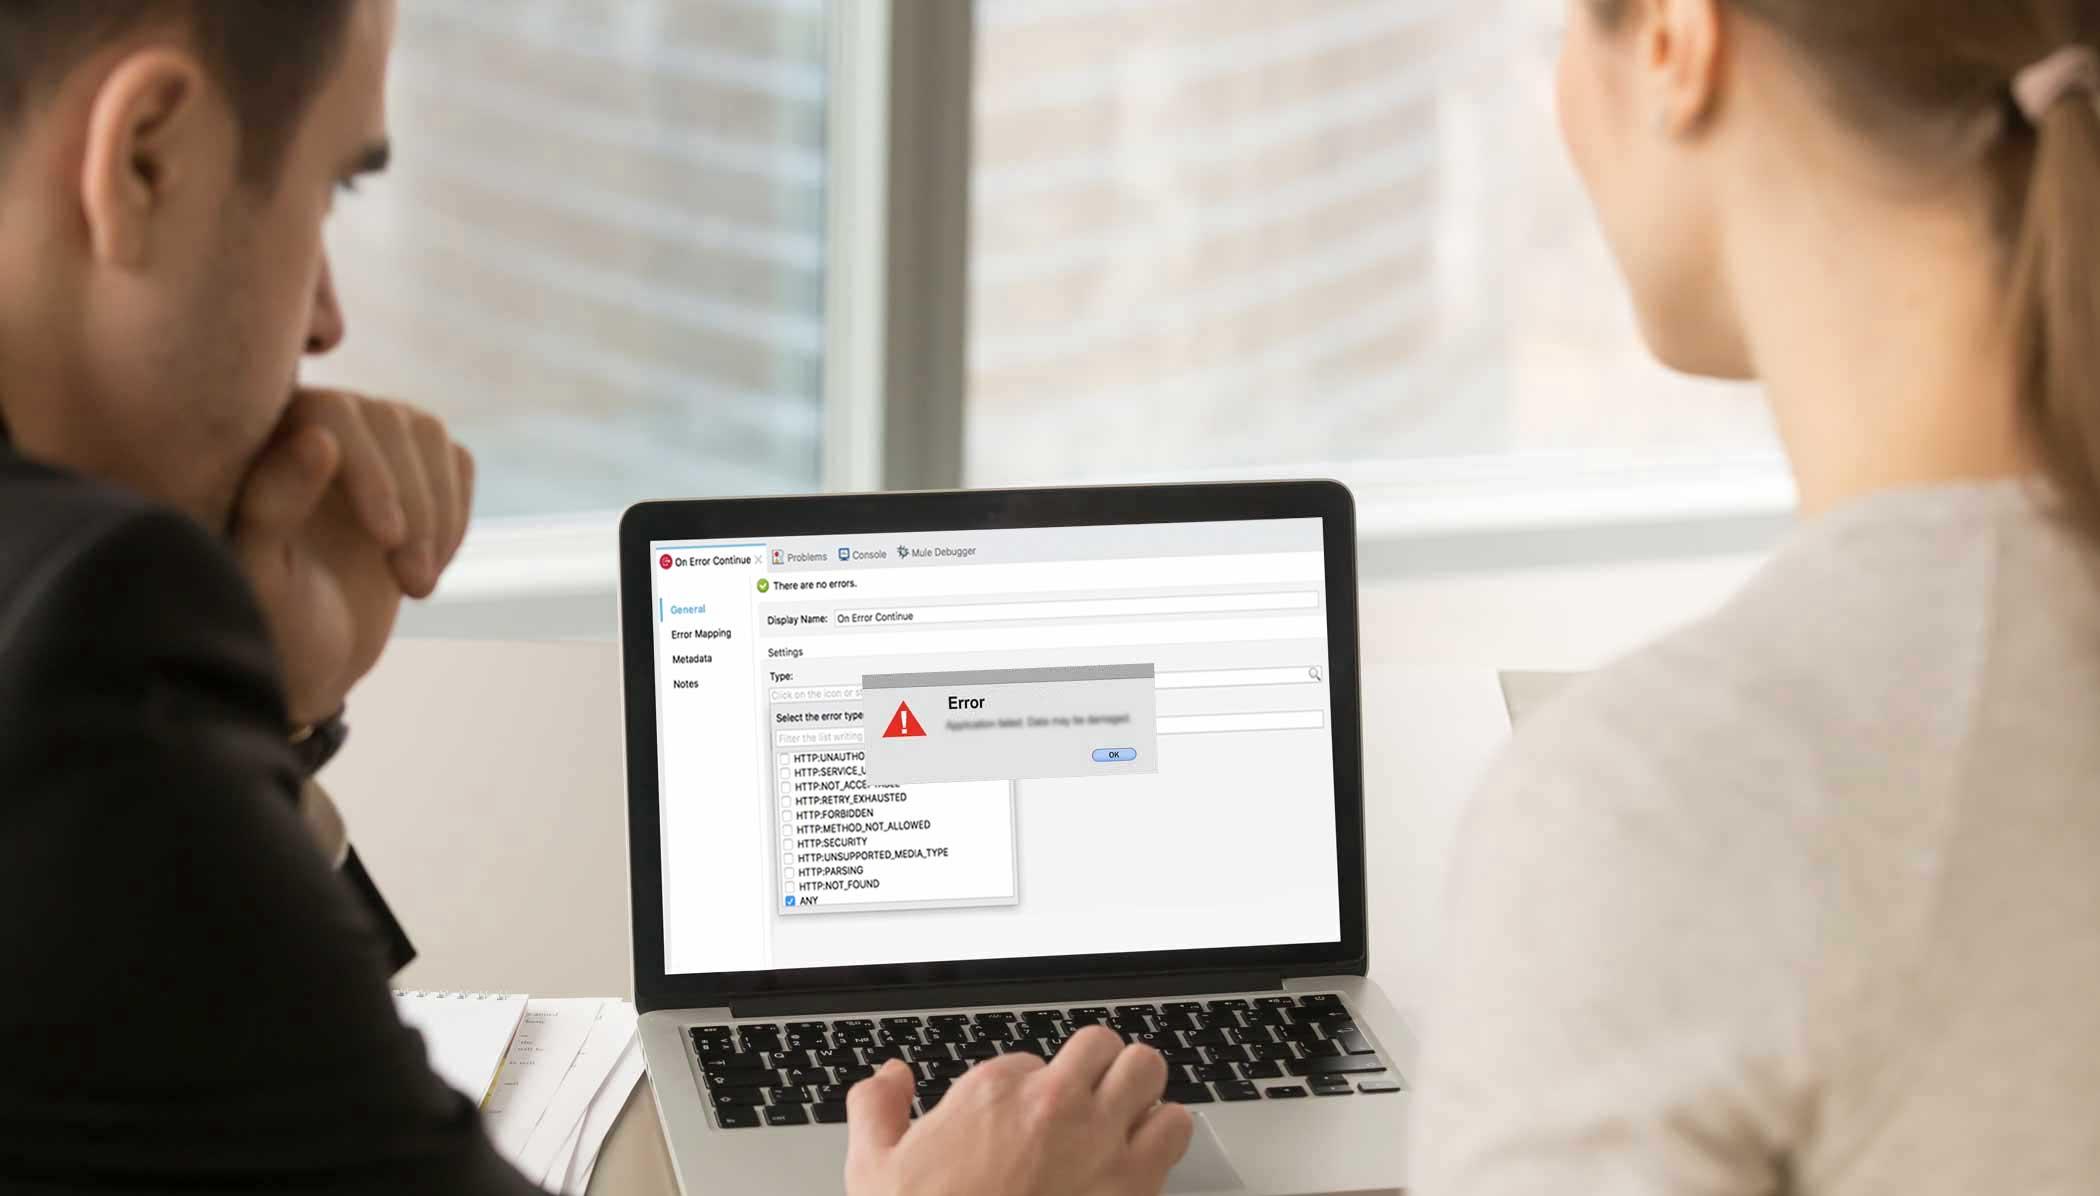 MuleSoft professionals working on Mule4 error handling